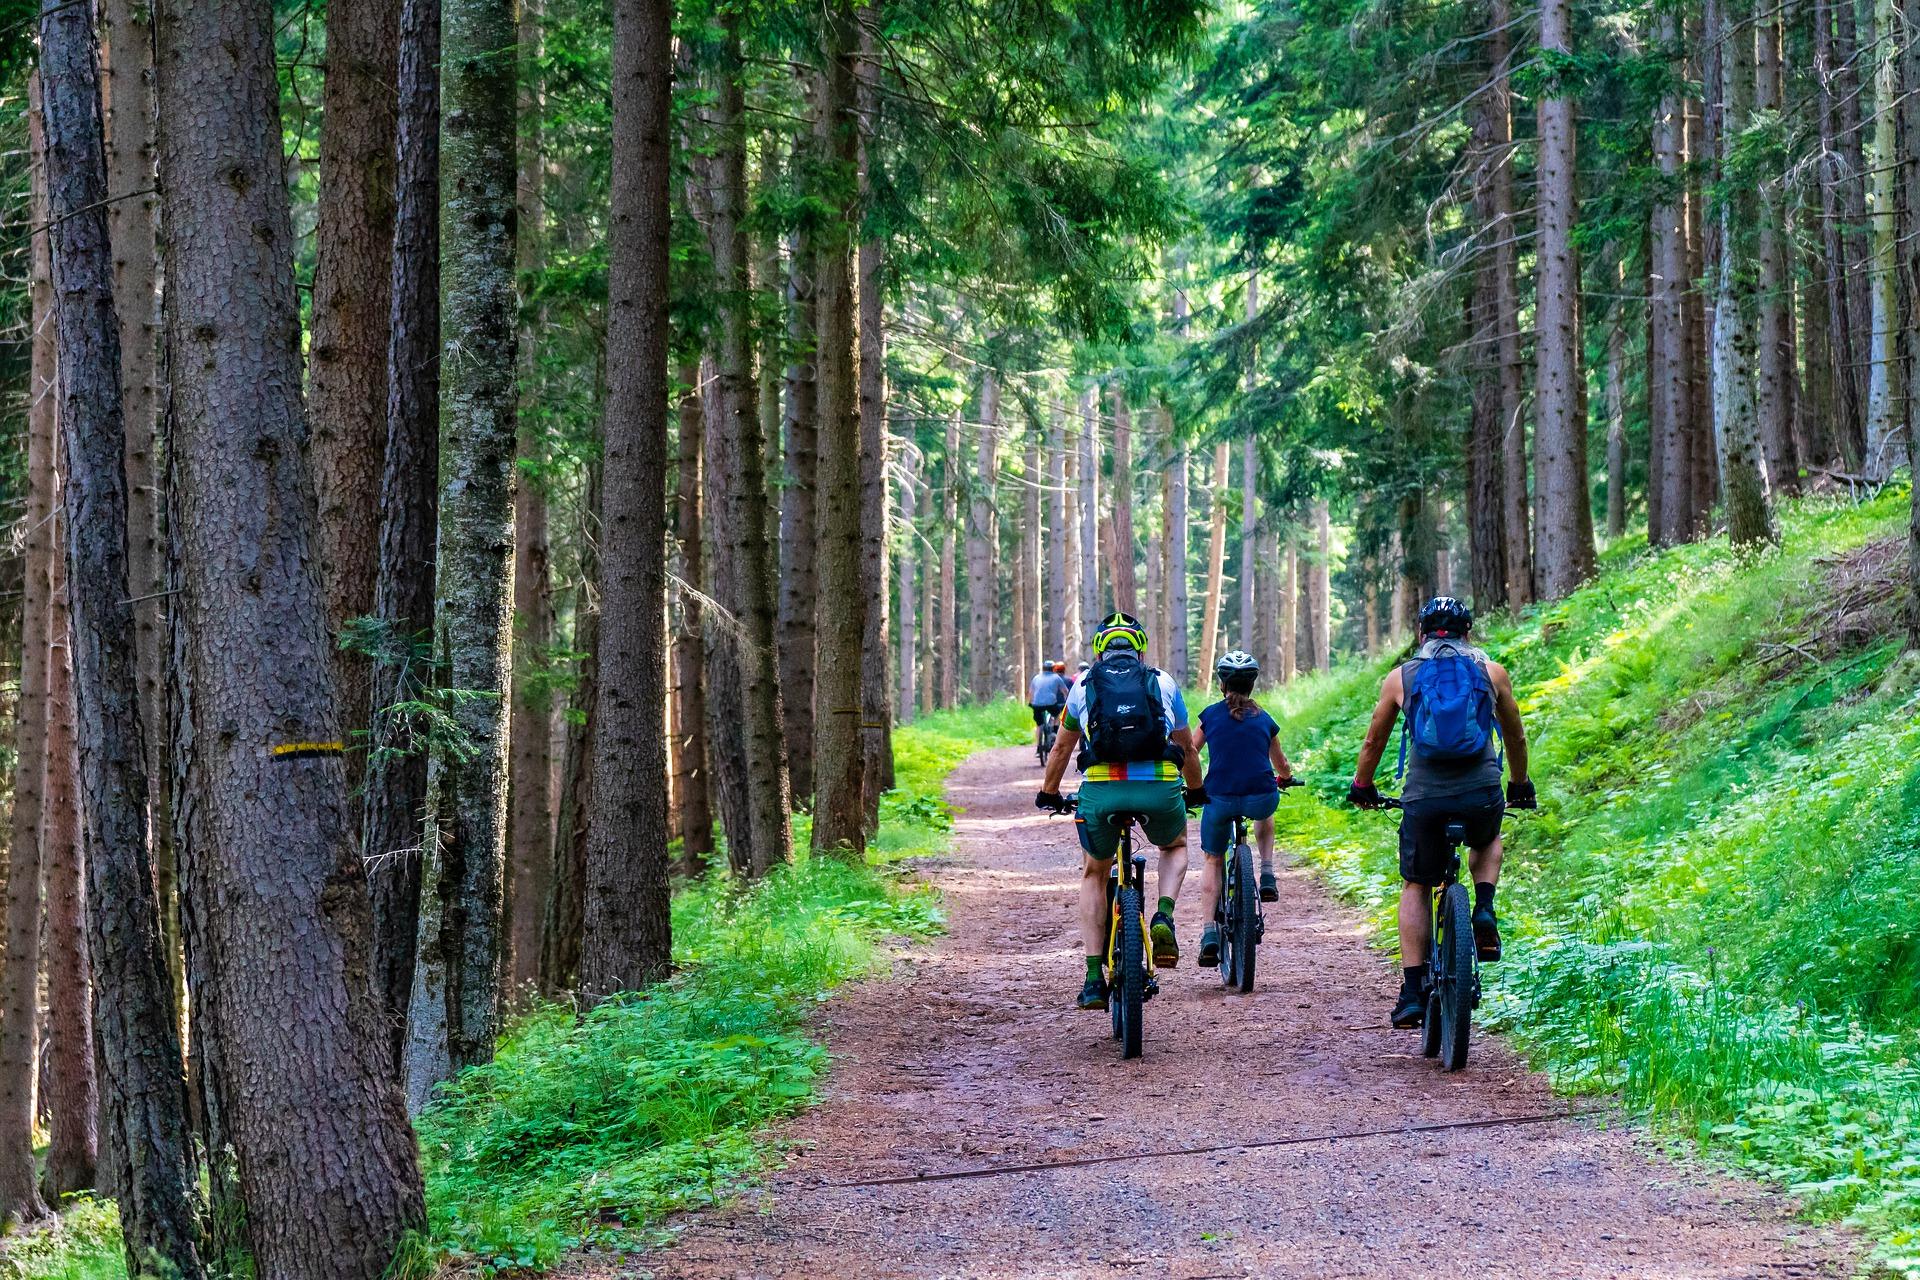 forest mountain biking trail pixabay